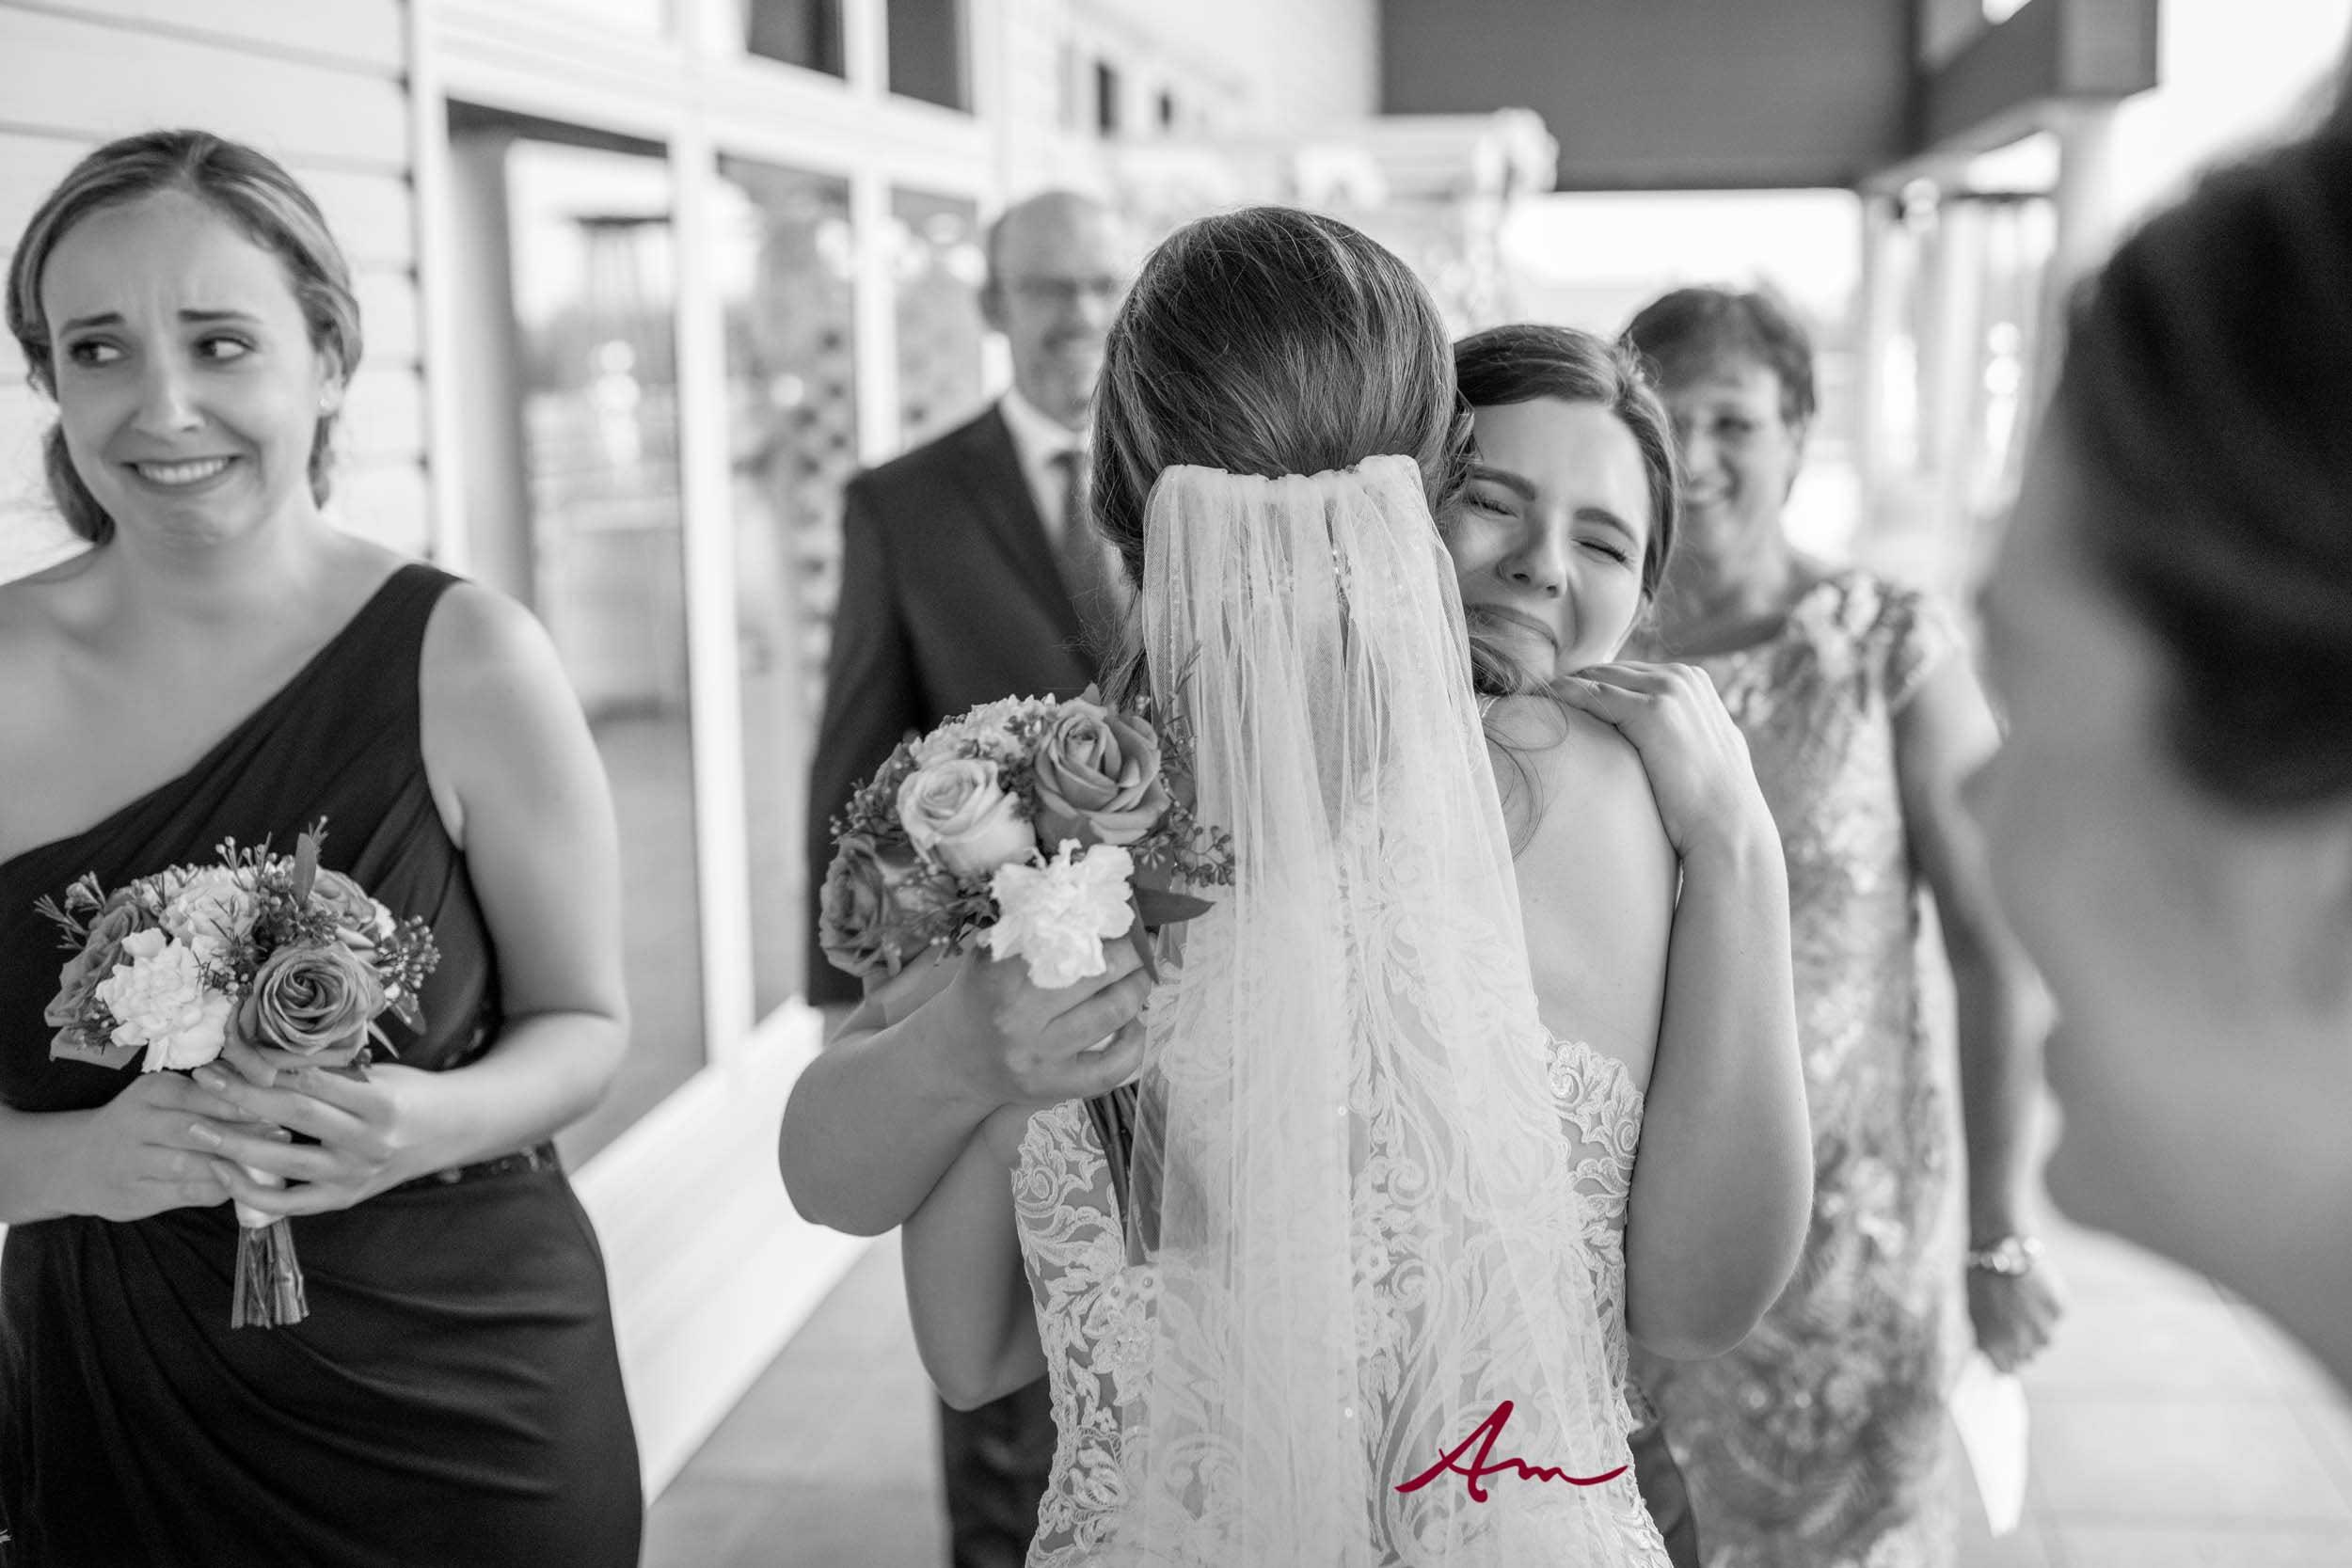 Fox-Harb'r-Wedding-Post-Ceremony-Hugs.jpg